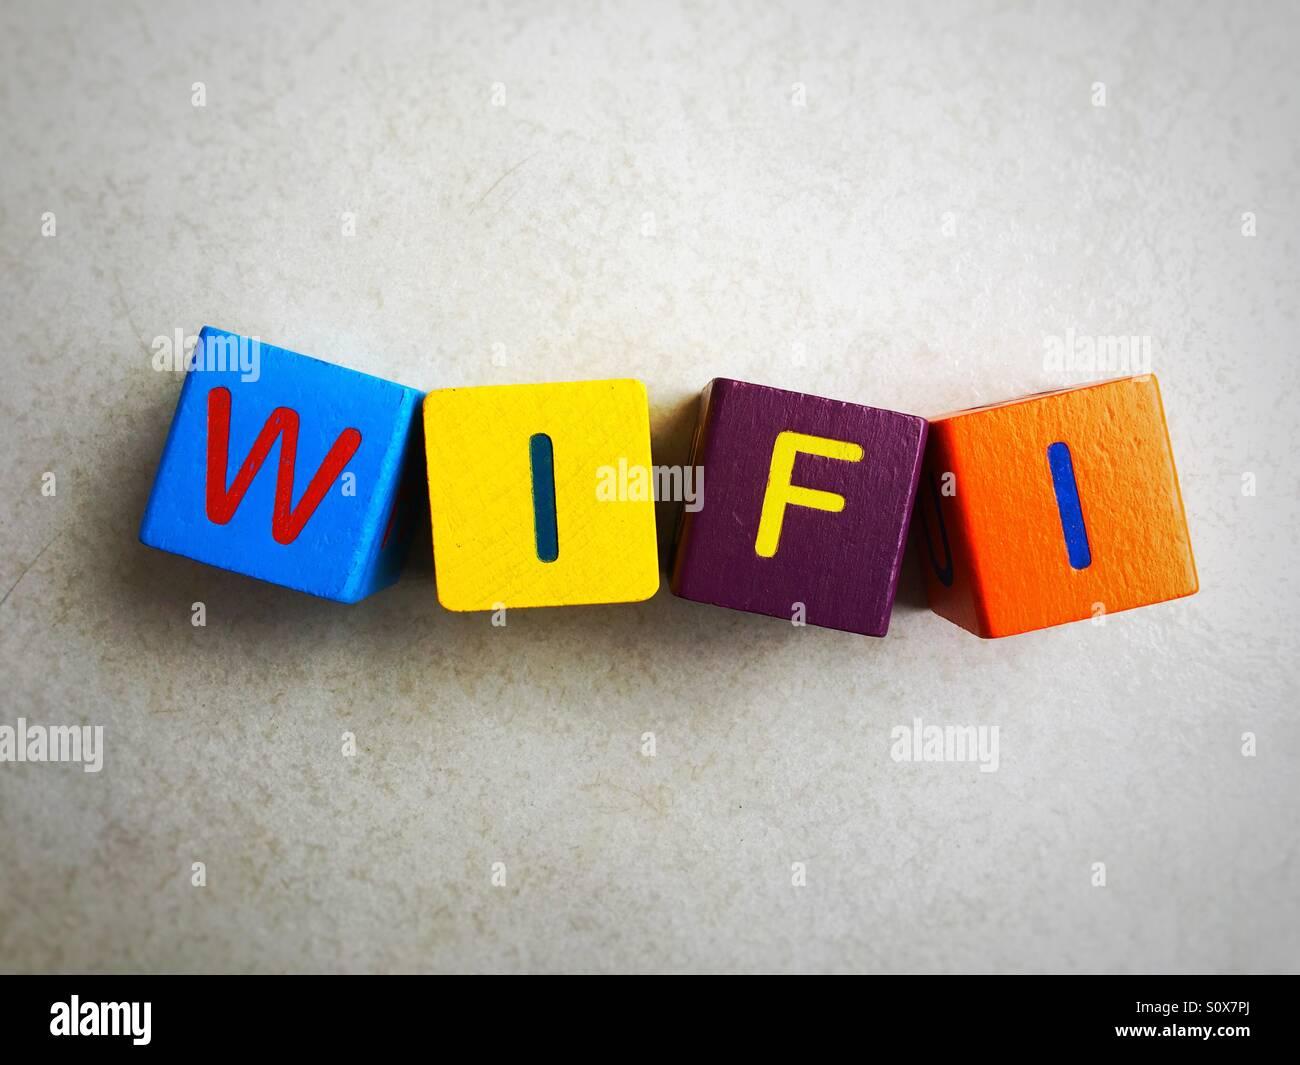 WiFi Photo Stock